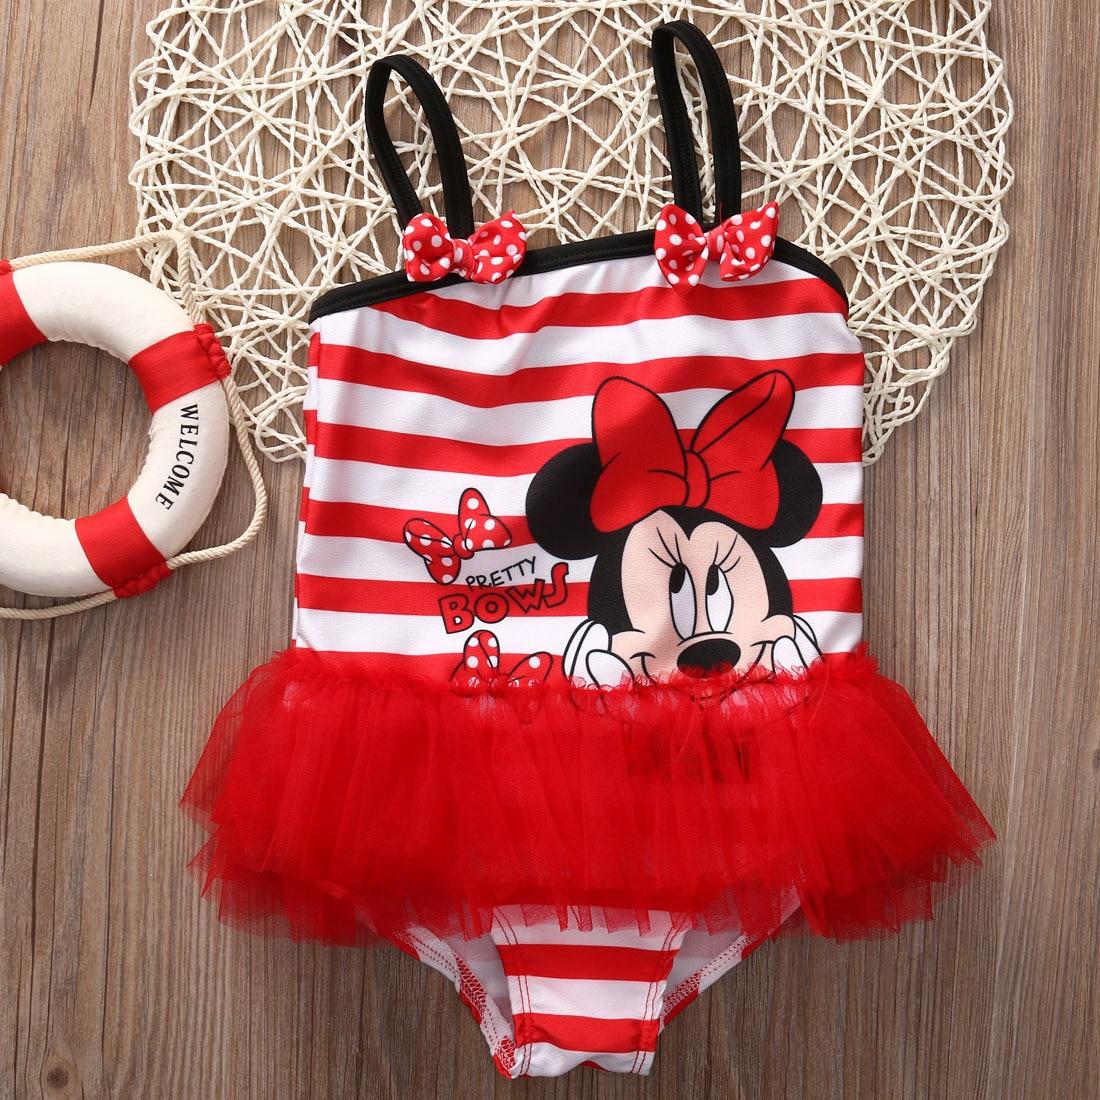 Child Baby Kids Girl Striped Minnie One Piece Swimsuit Swimwear Monokini Bikini Bathing Suit Tutu Swimsuit(China)